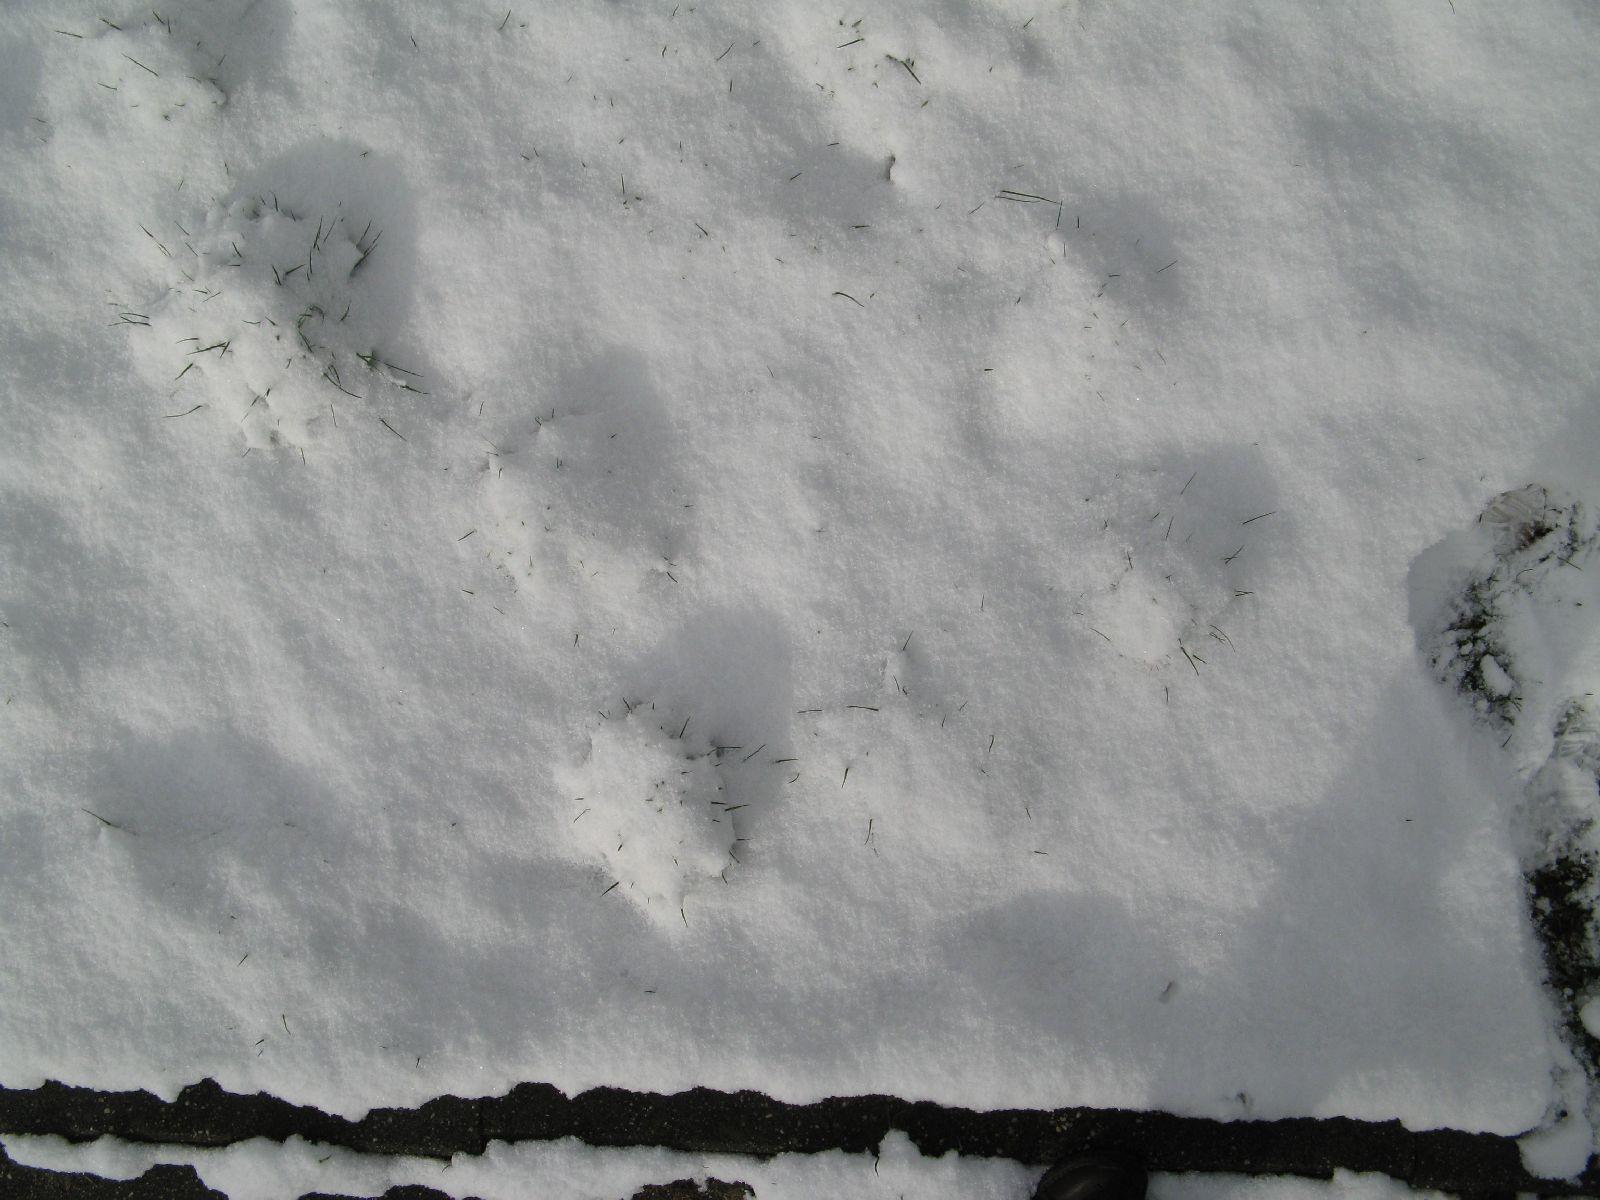 Schnee-Eis_Textur_B_5840